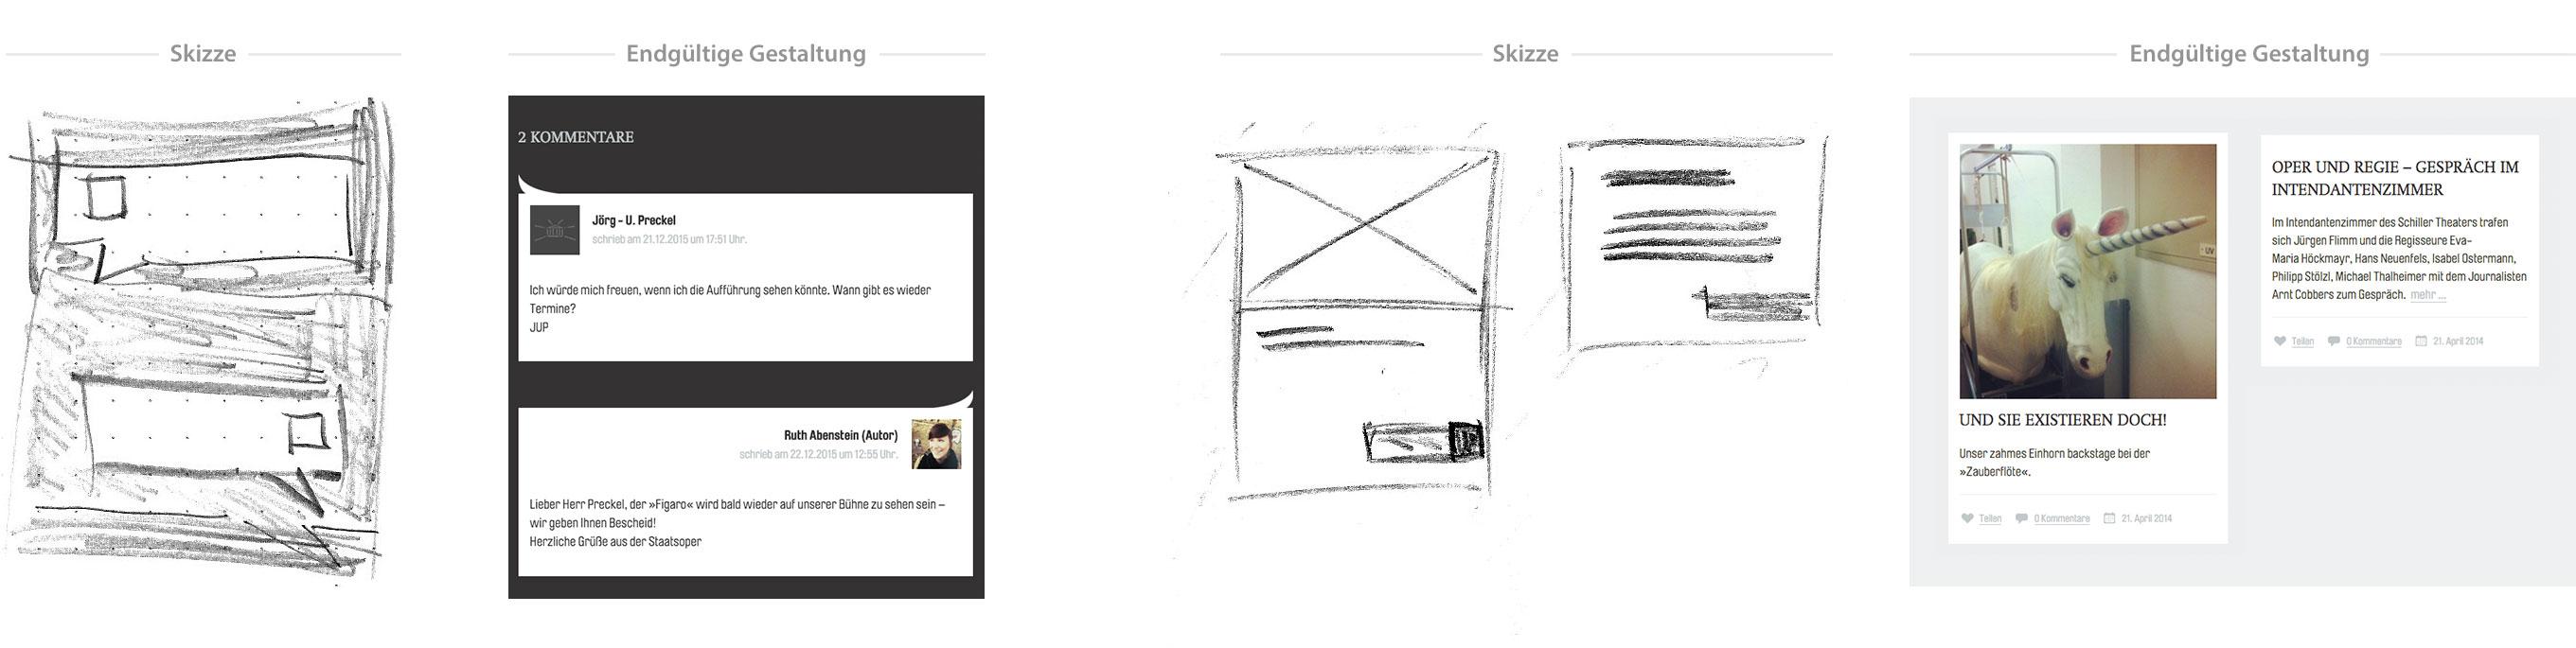 staatsoper-skizzen-layout